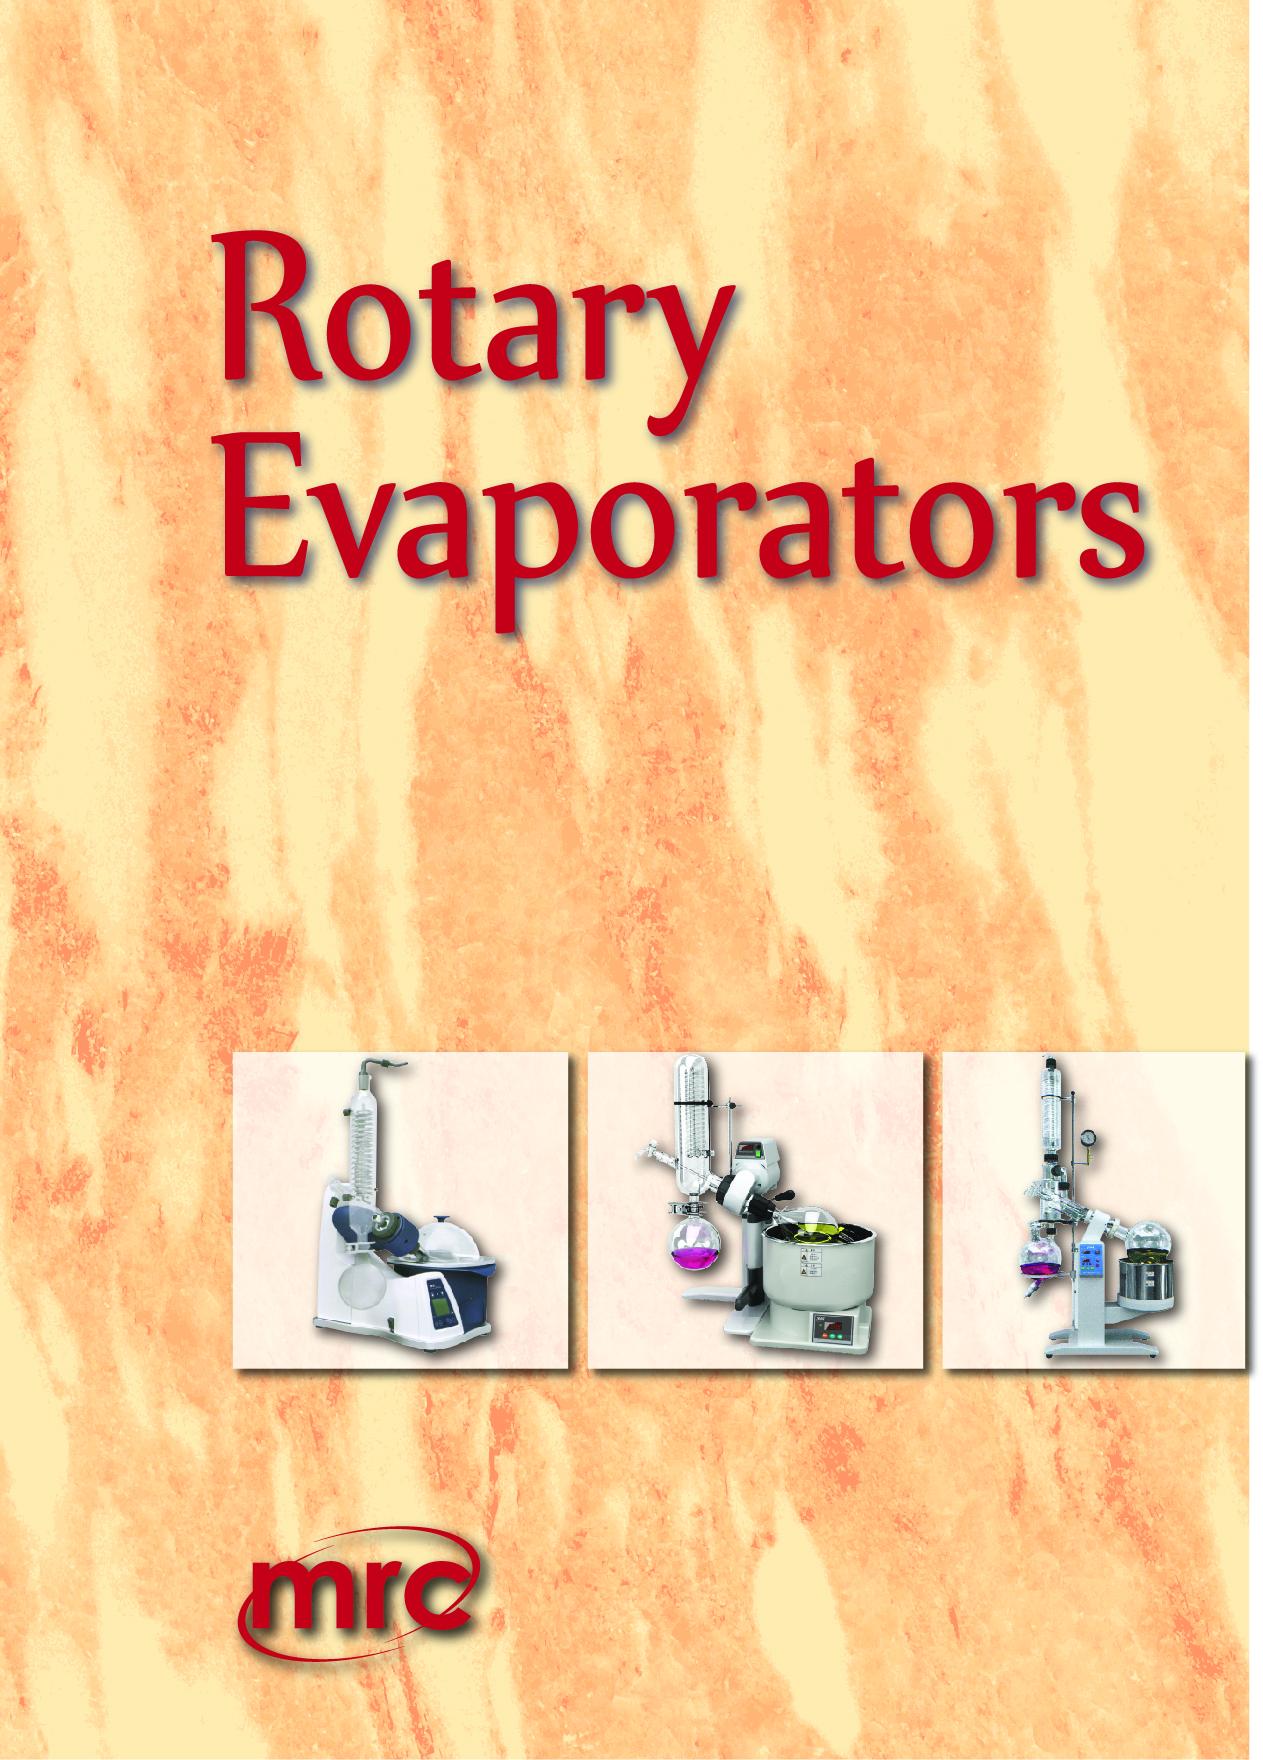 ROTARY-EVAPORATORS-COVER2016.jpg